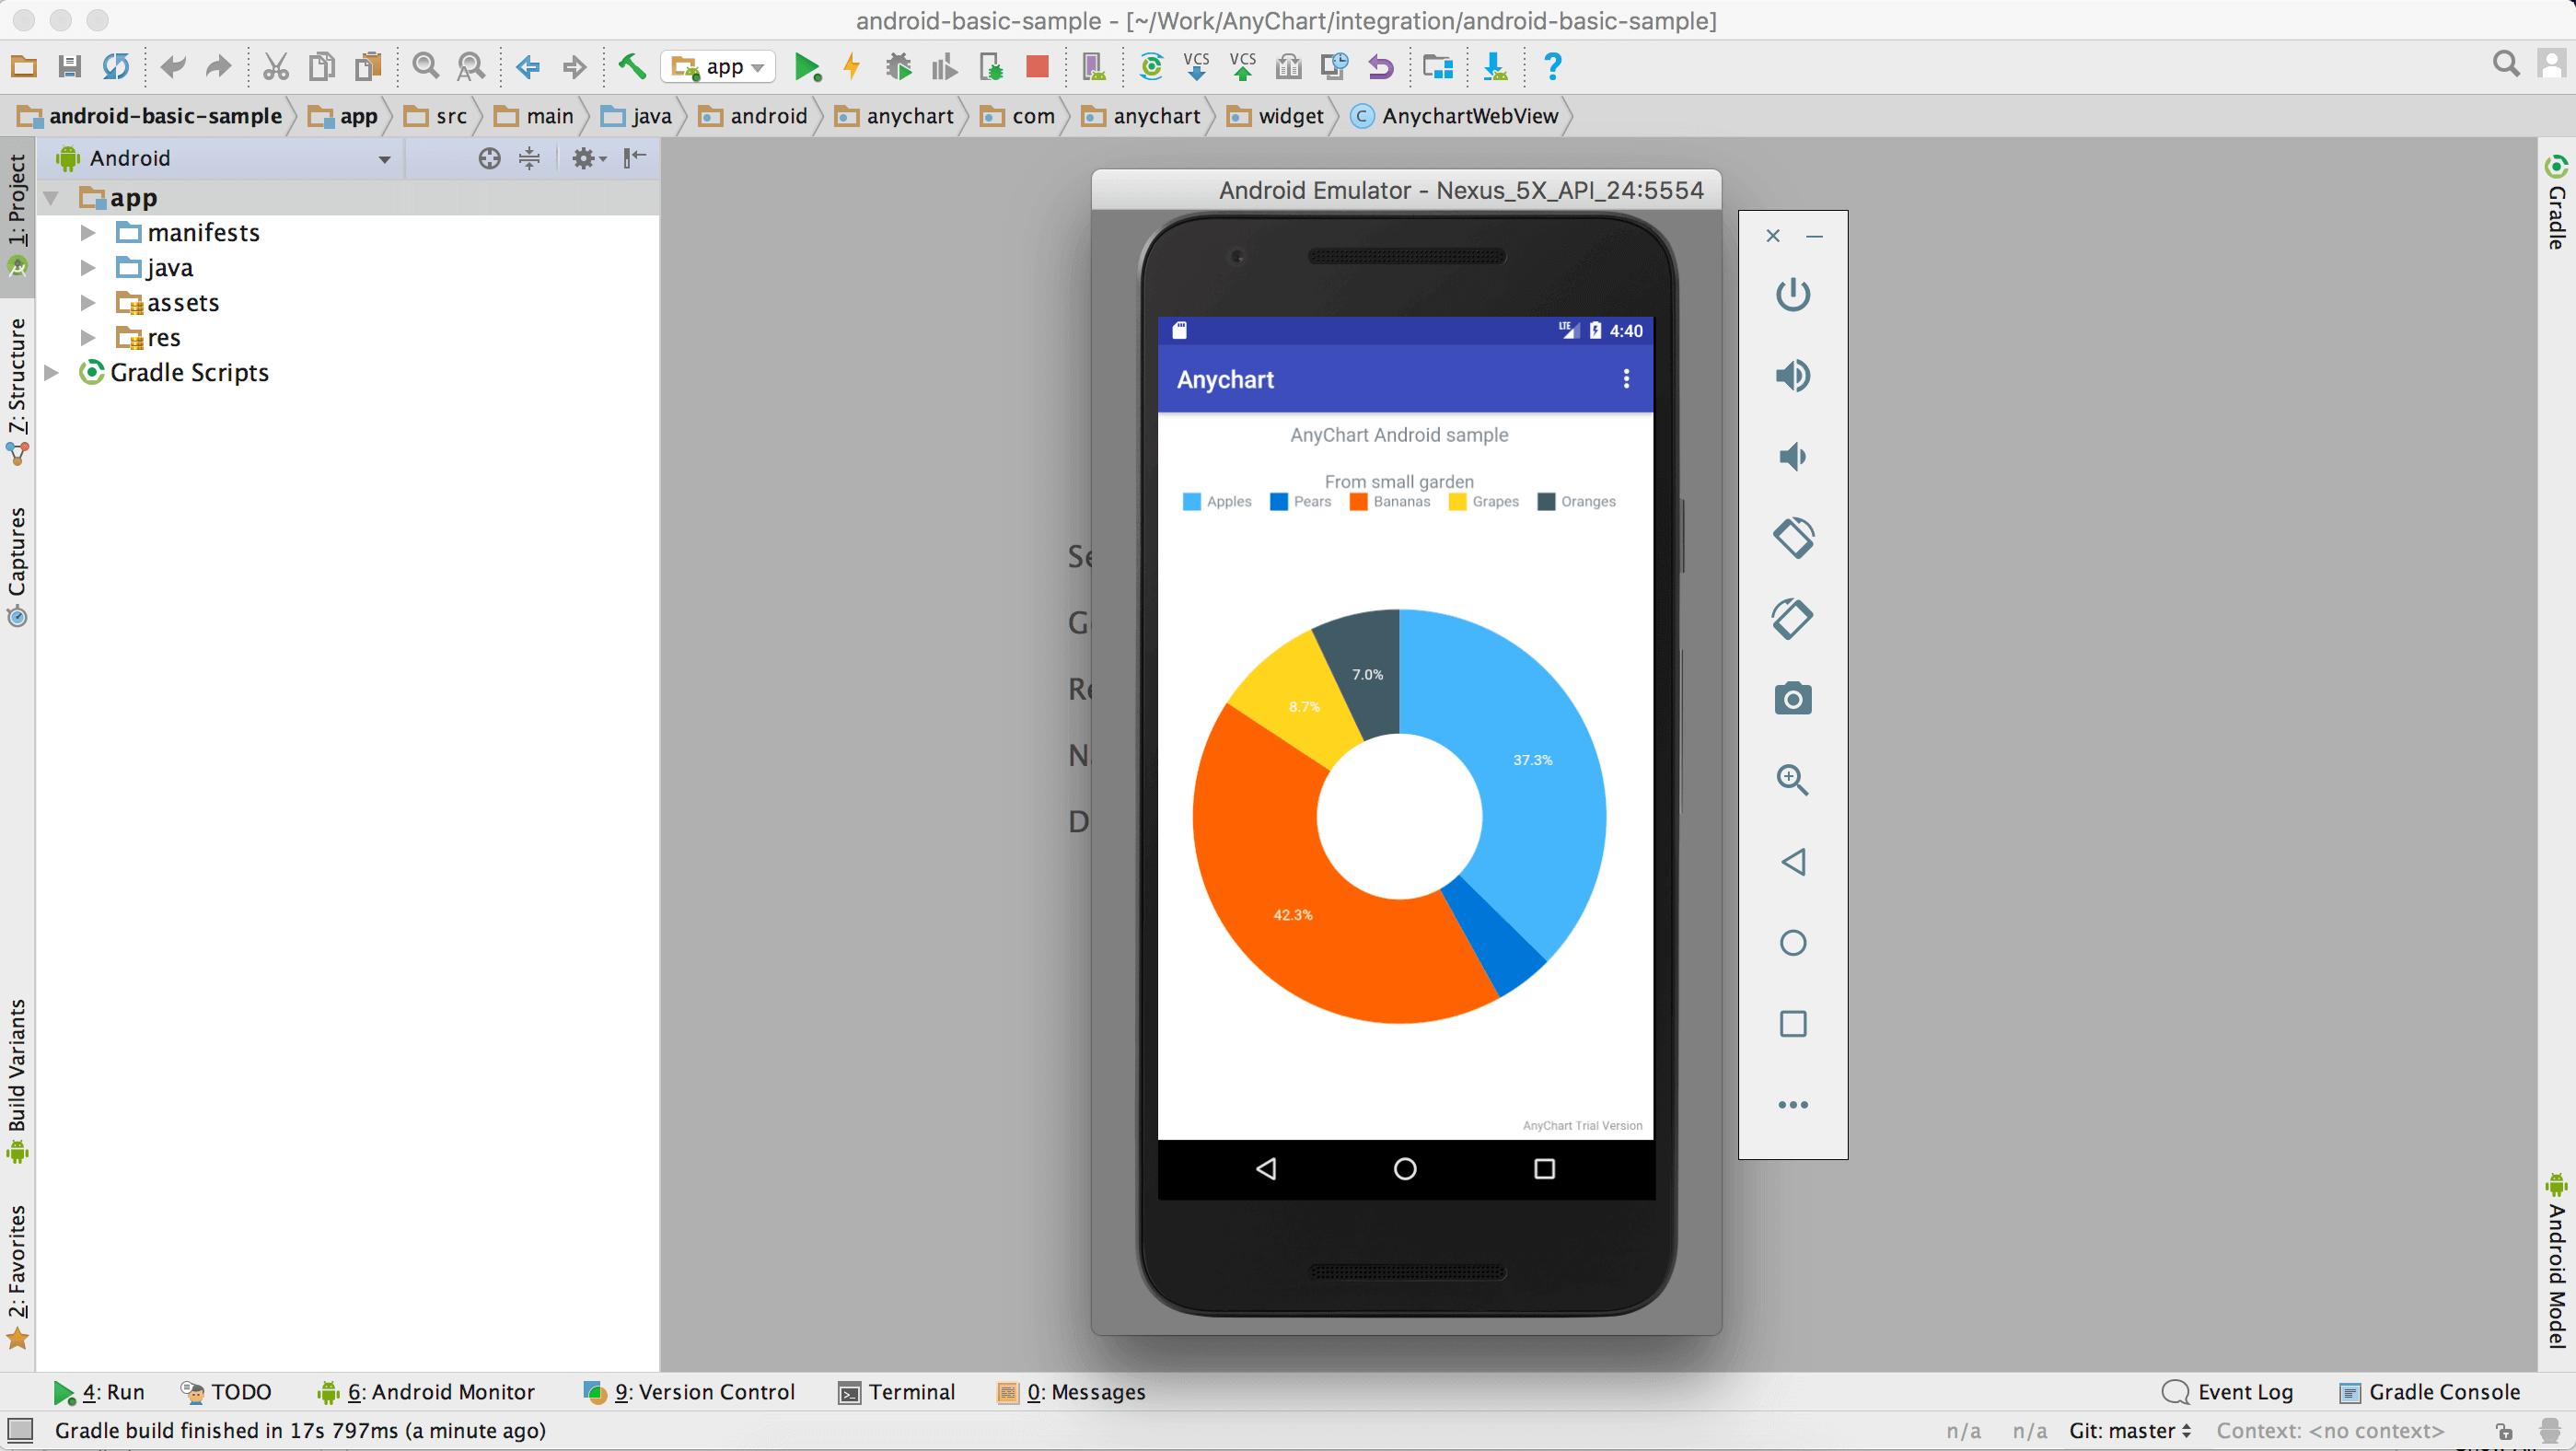 Android Basic Sample | AnyChart